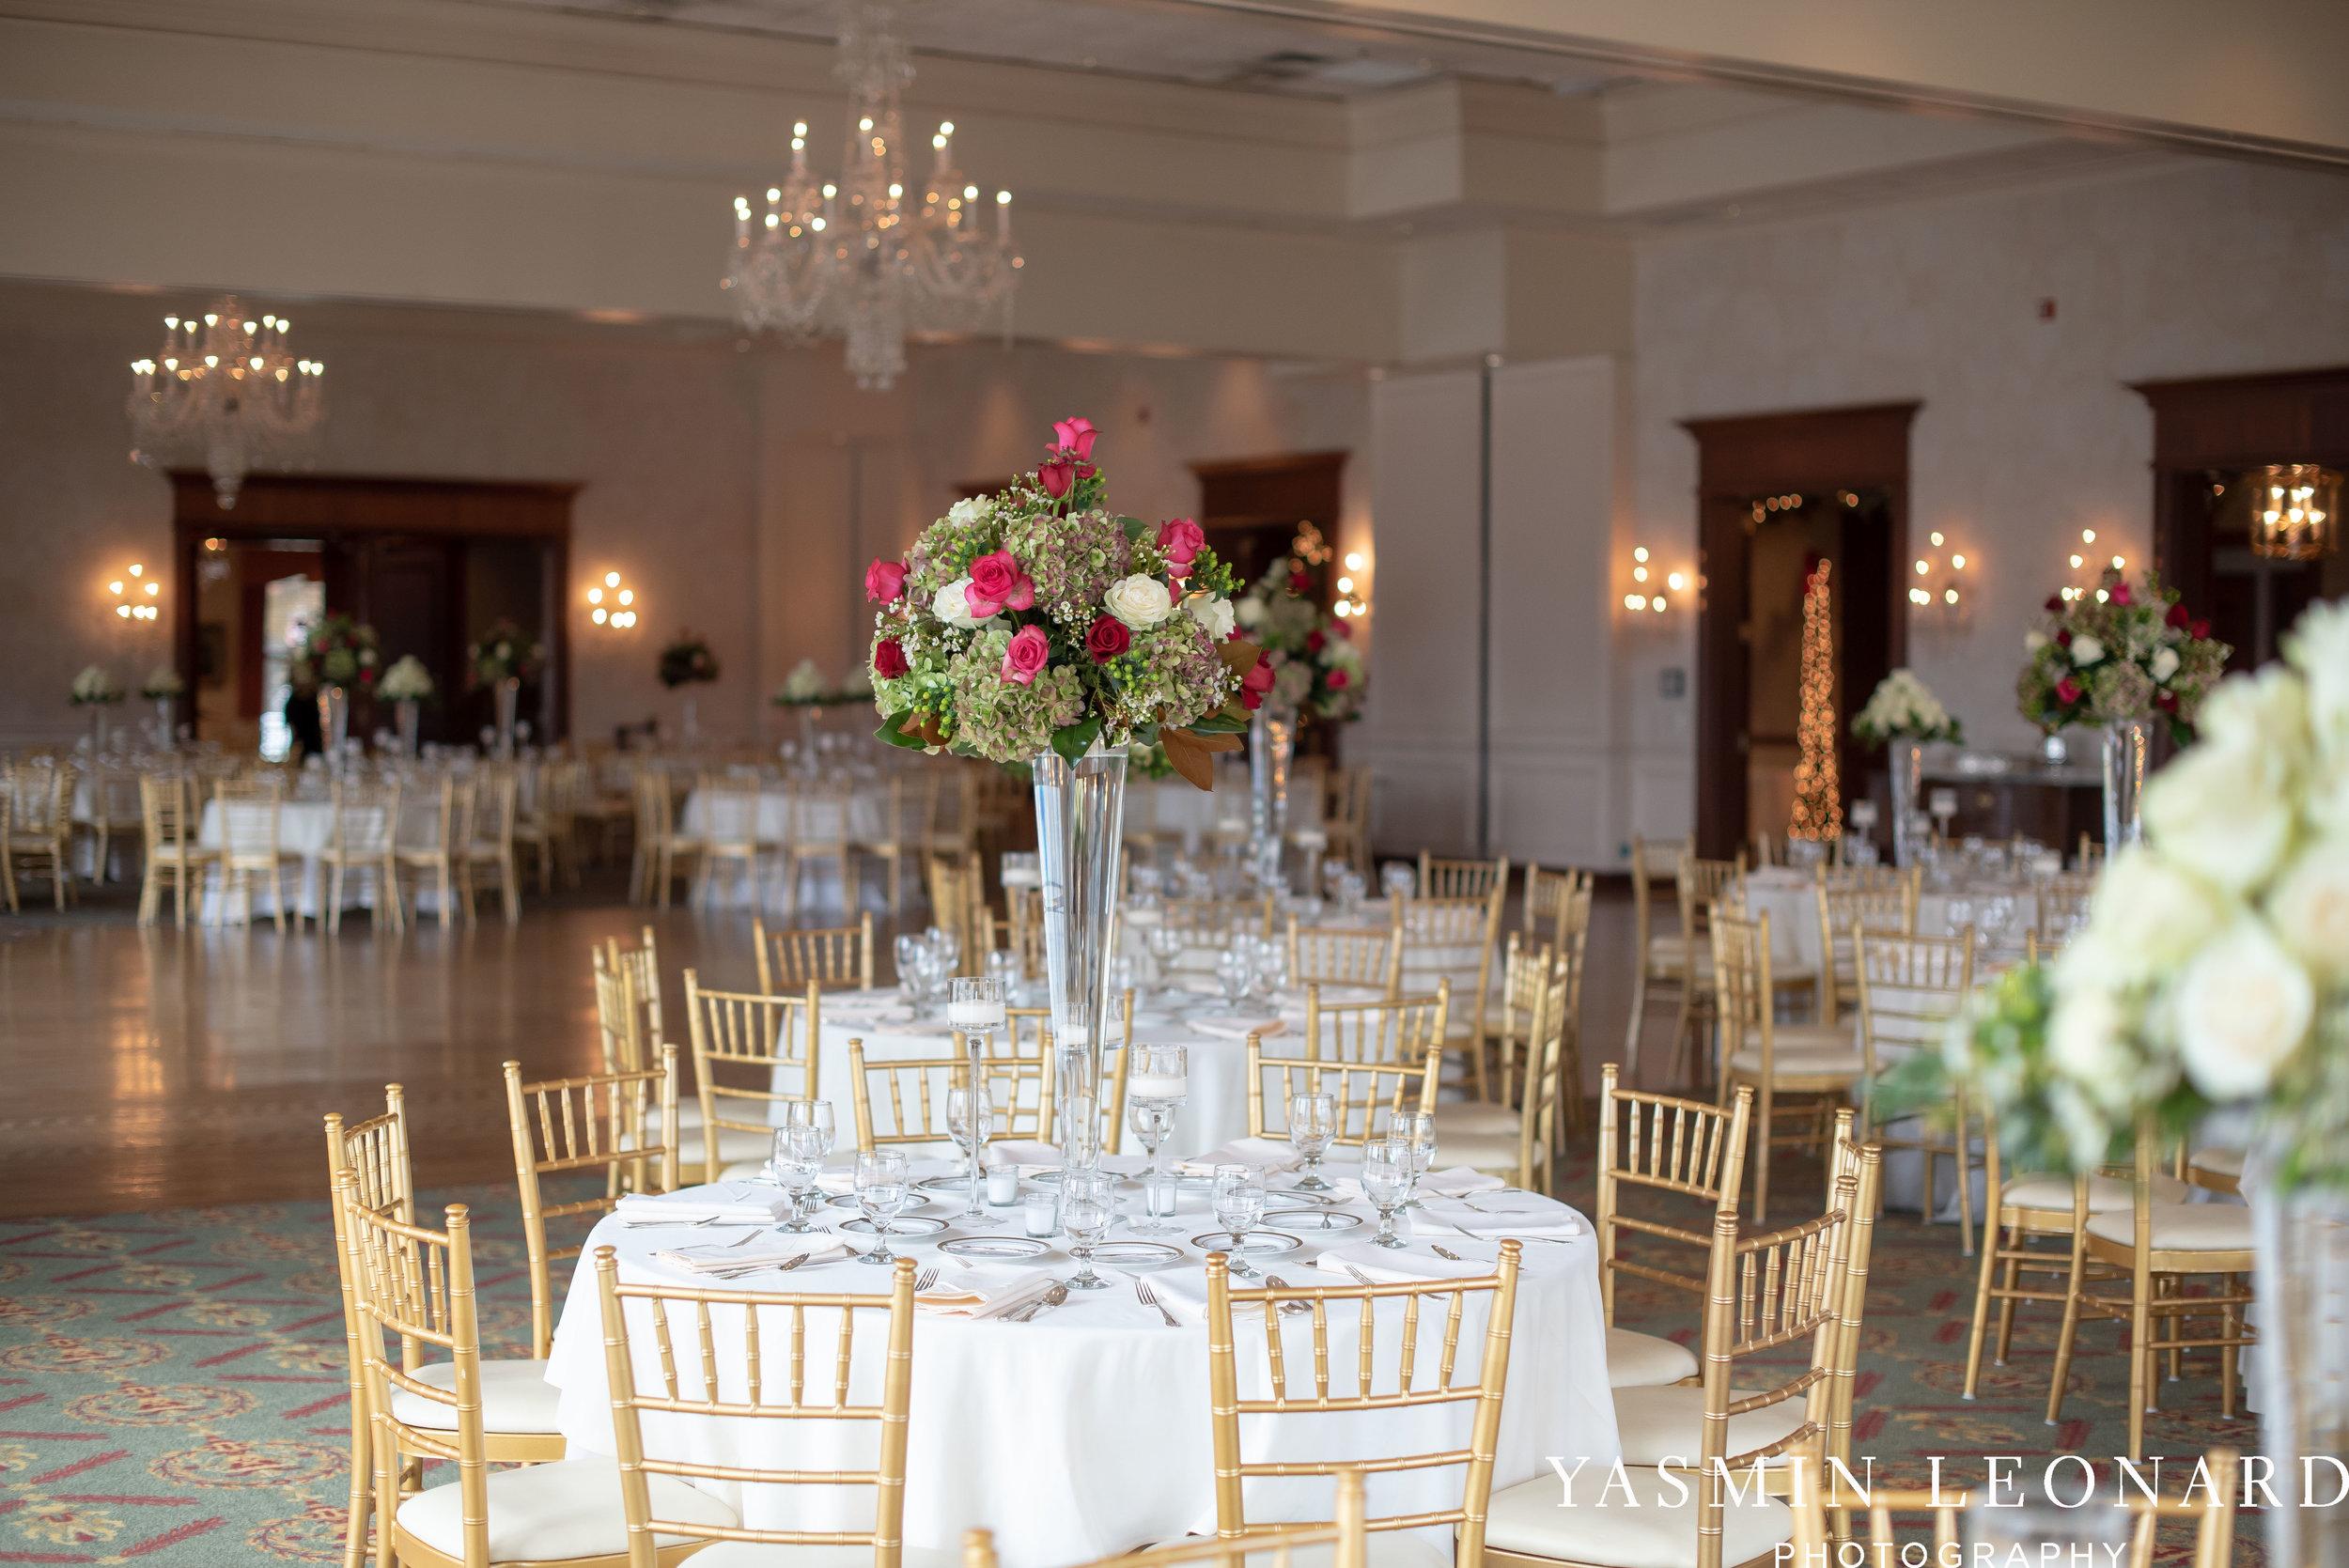 Wesley Memorial UMC - High Point Country Club - Emerywood Country Club - High Point Weddings - High Point Wedding Photographer - Yasmin Leonard Photography-28.jpg